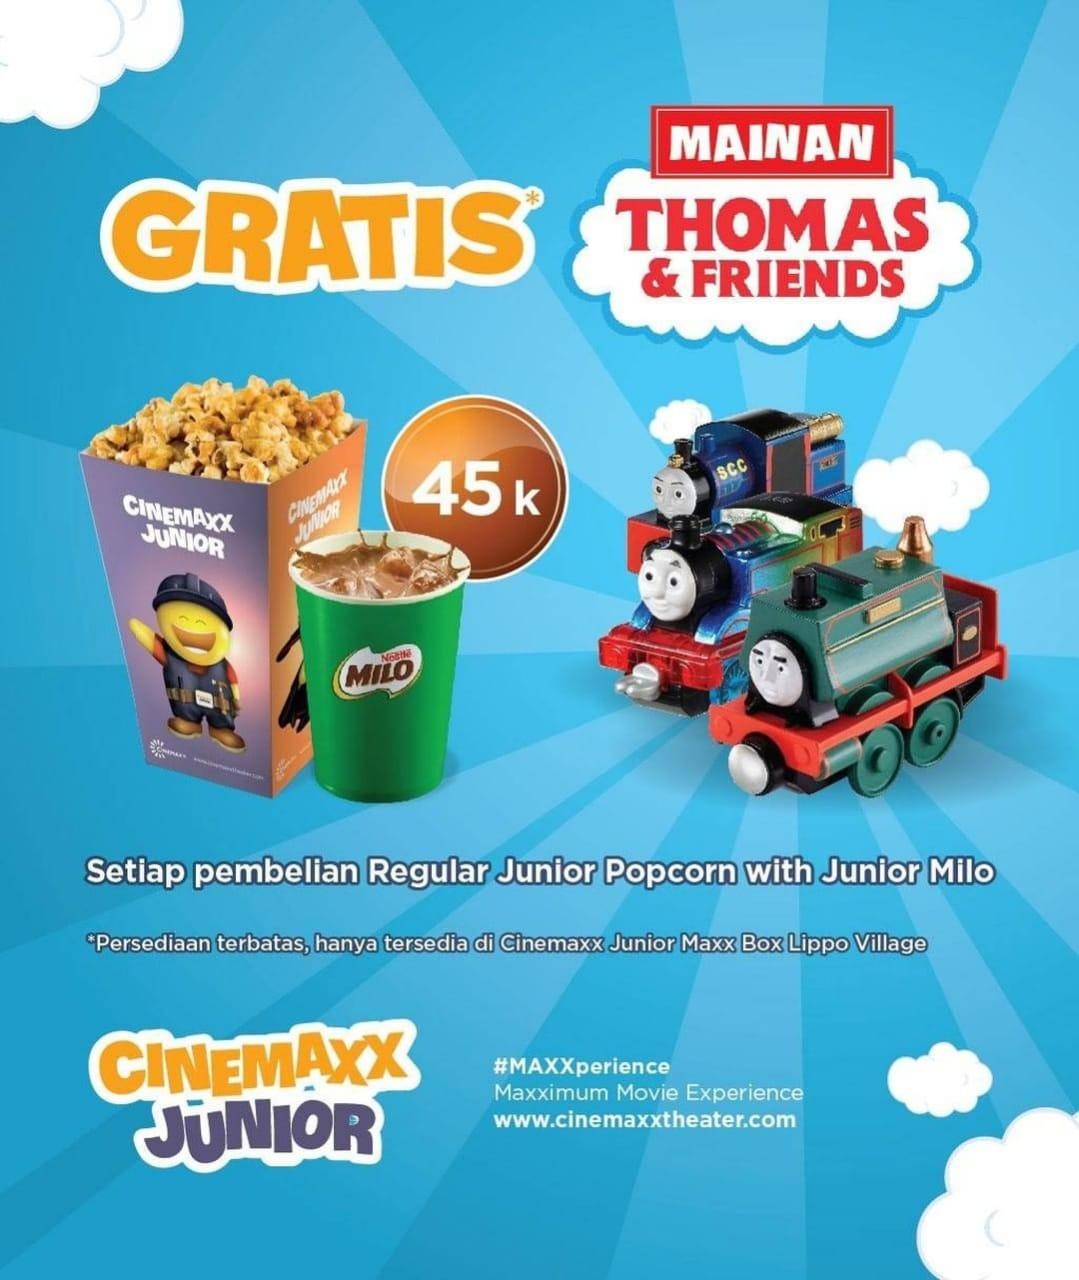 Cinemaxx Theater Promo Spesial Gratis Mainan Thomas & Friends